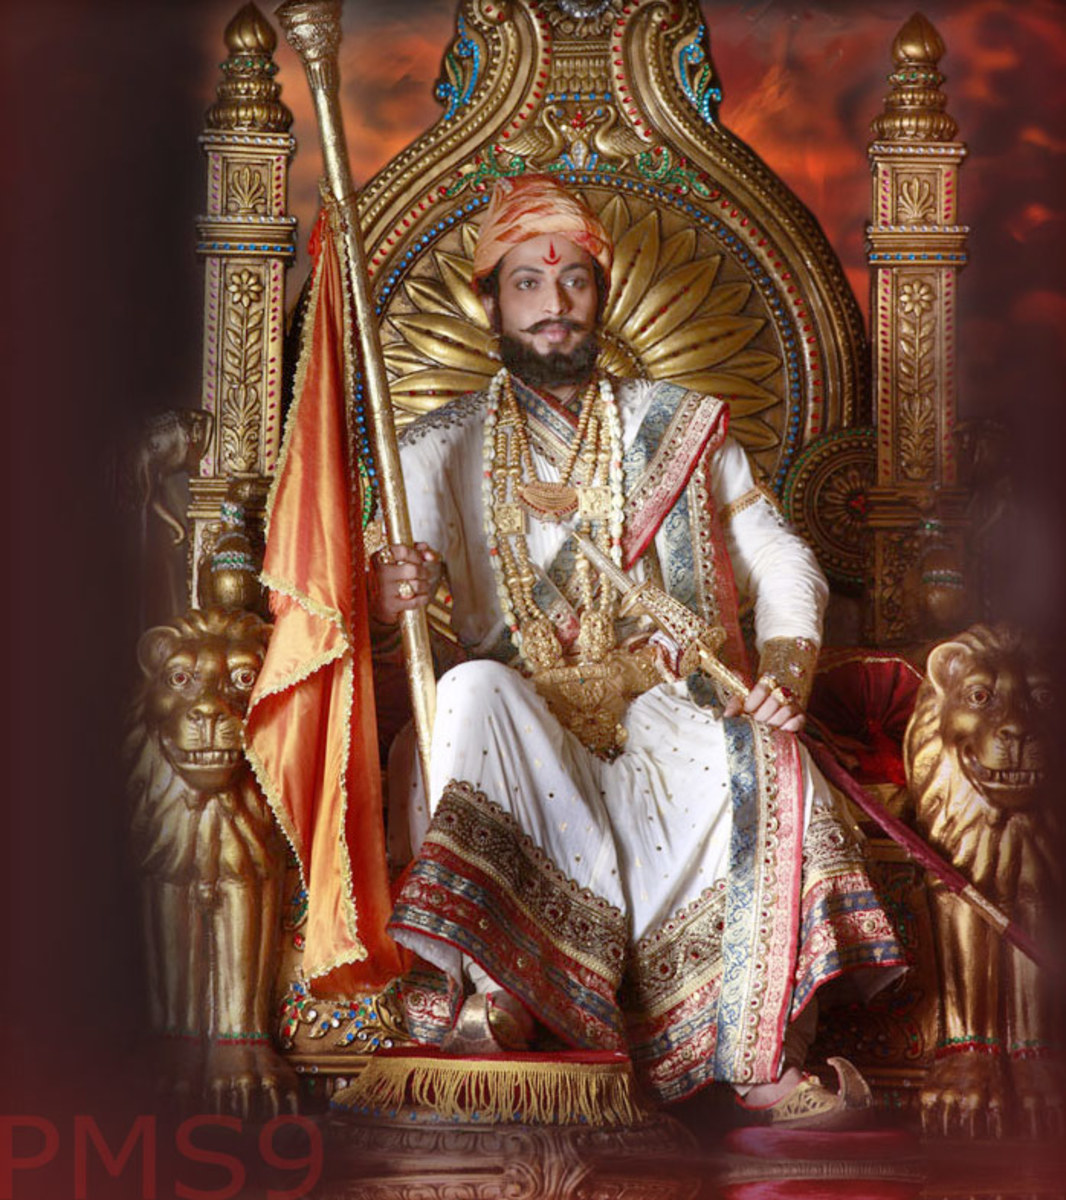 Amol Kolhe as a Shivaji